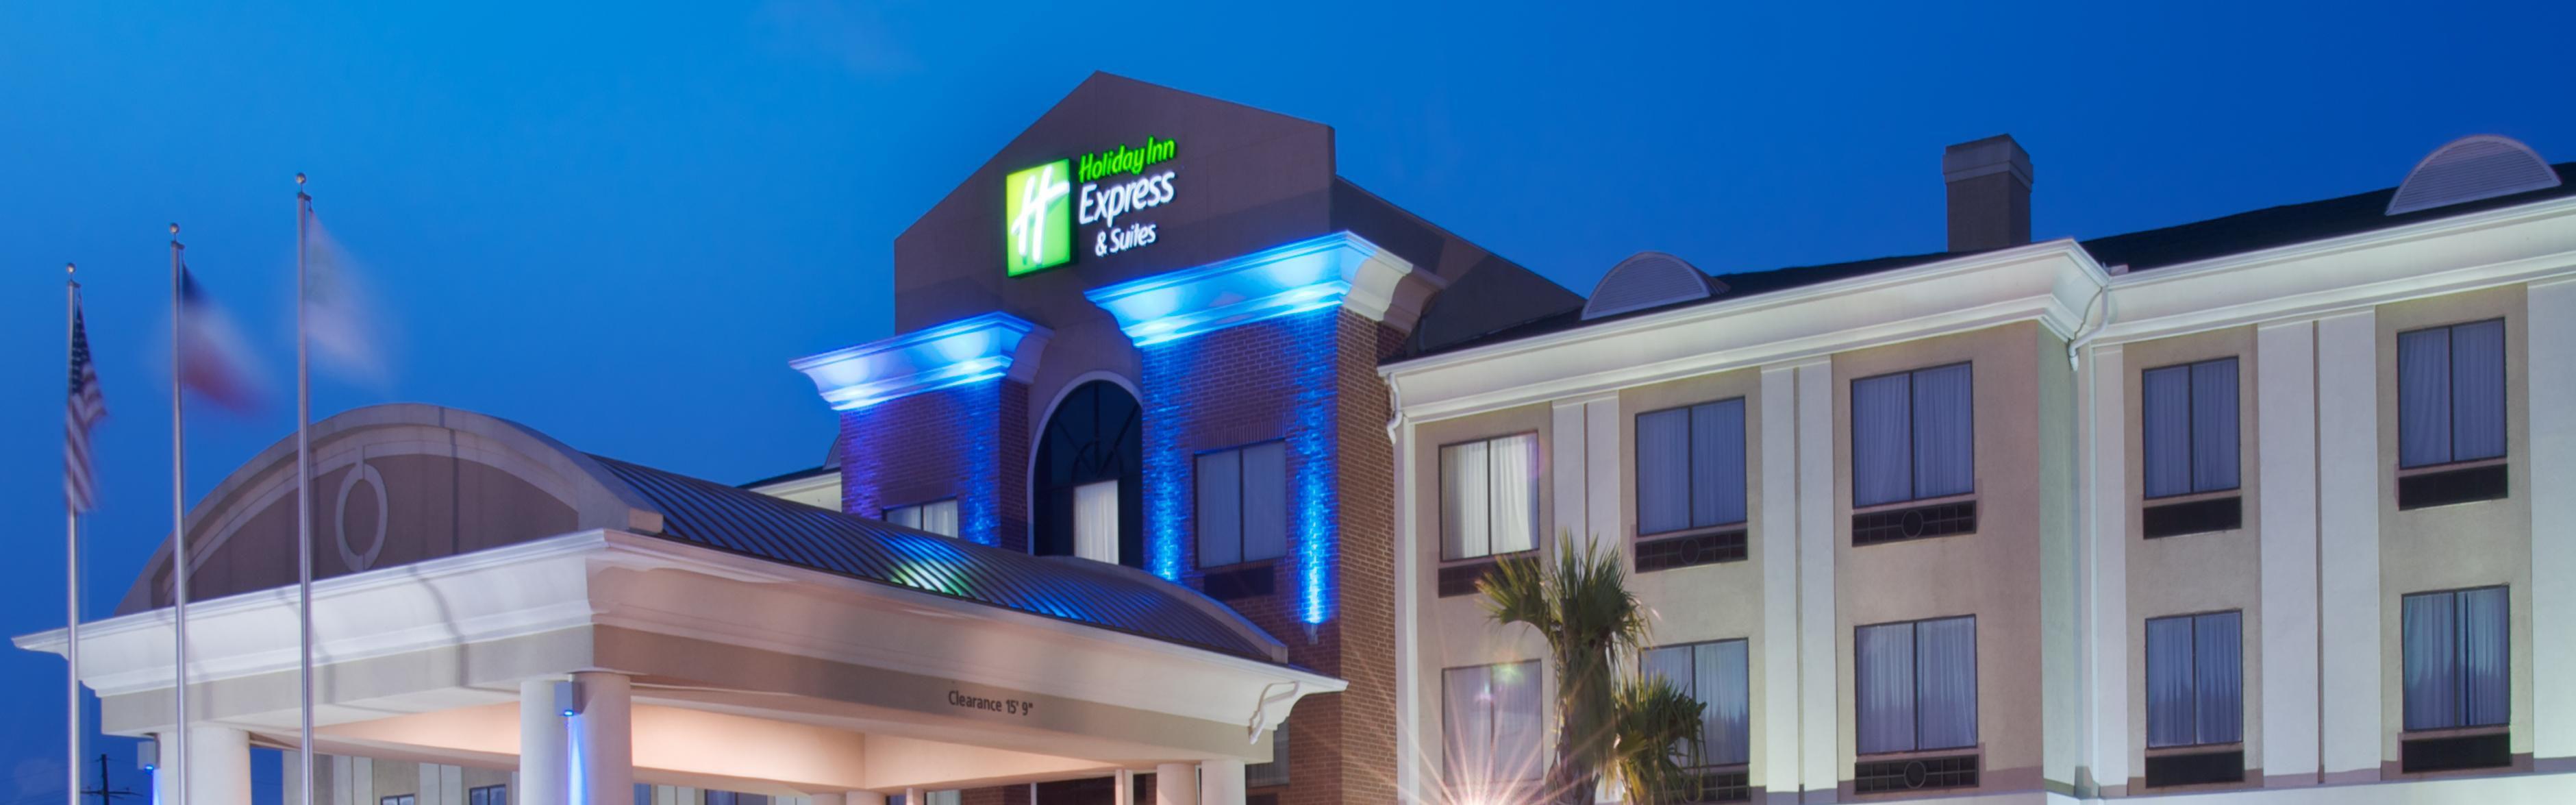 Holiday Inn Express Orange image 0